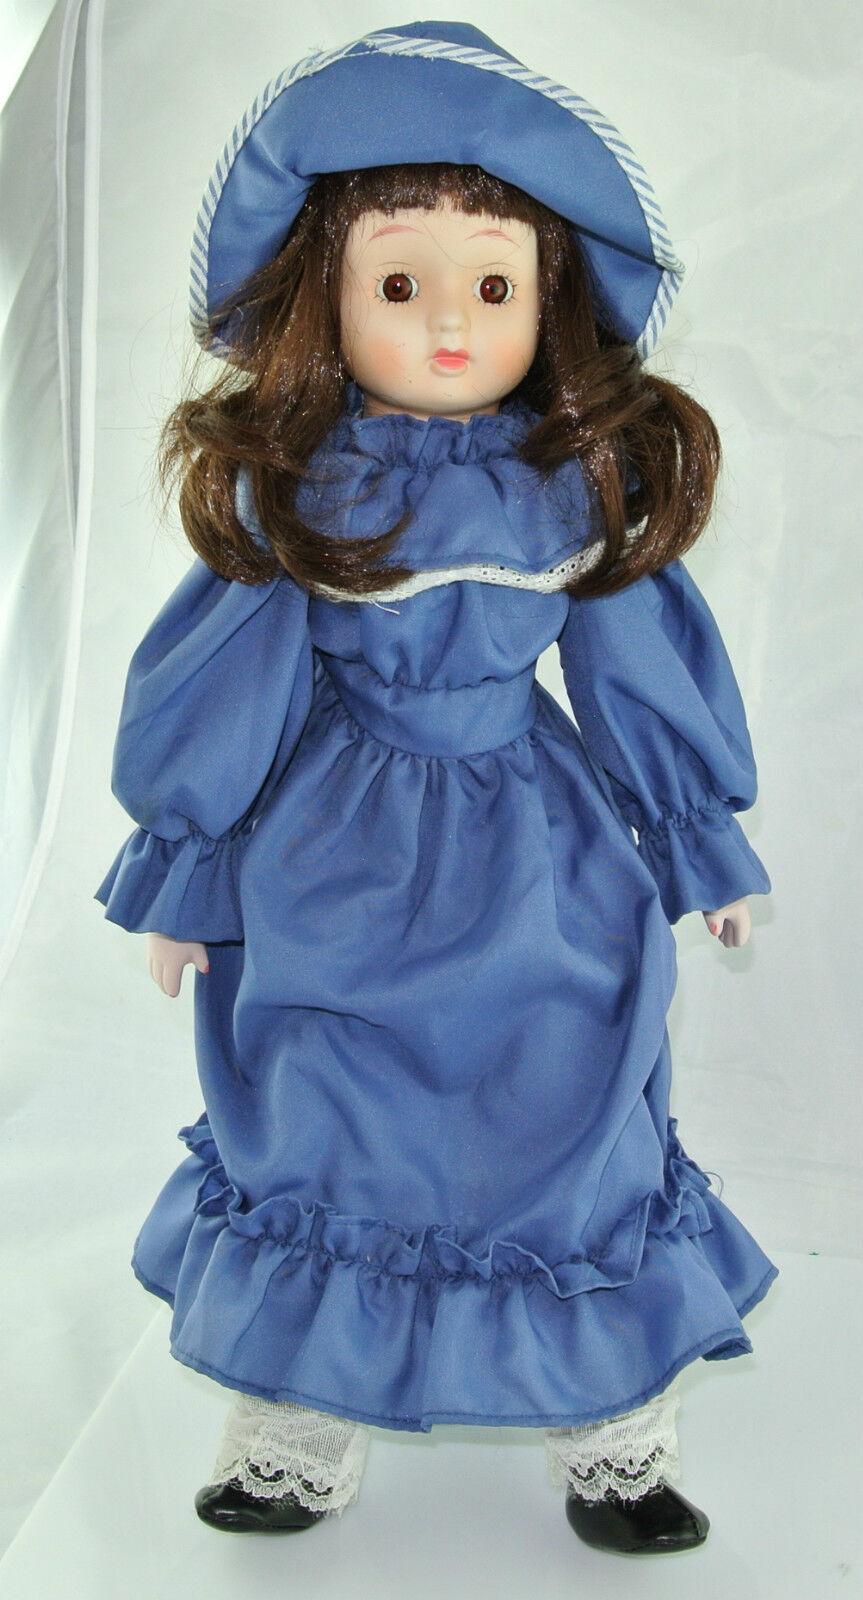 Tiller Puppe mit Blauem Kleid & Hut   Porzellankopf & Stoffkörper   ca. 44 cm